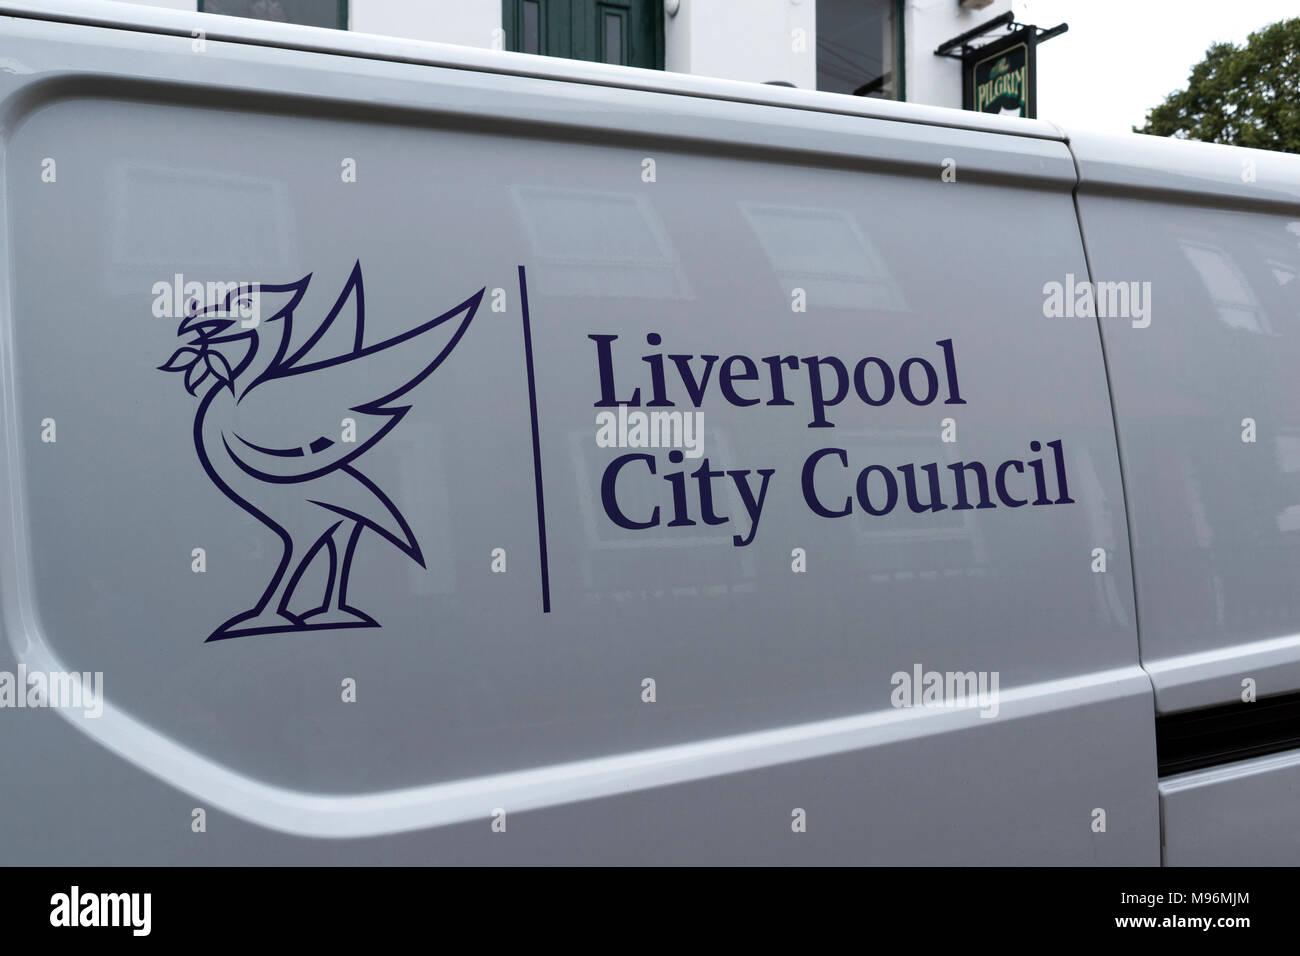 liverpool city council van - Stock Image